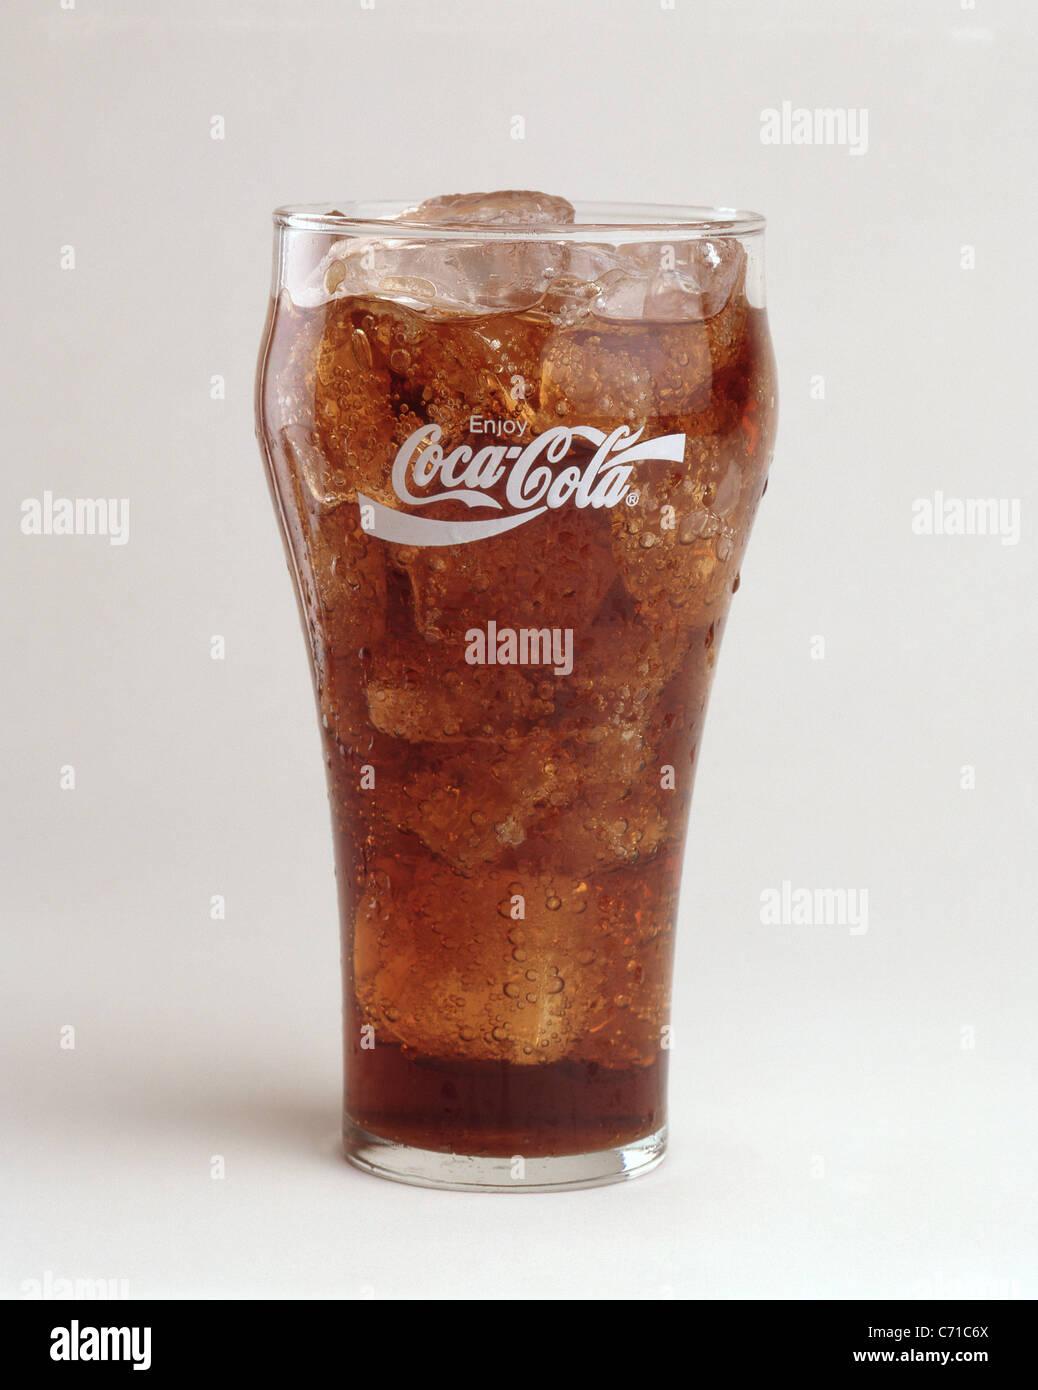 Classic glass of Coca-Cola, United States of America - Stock Image